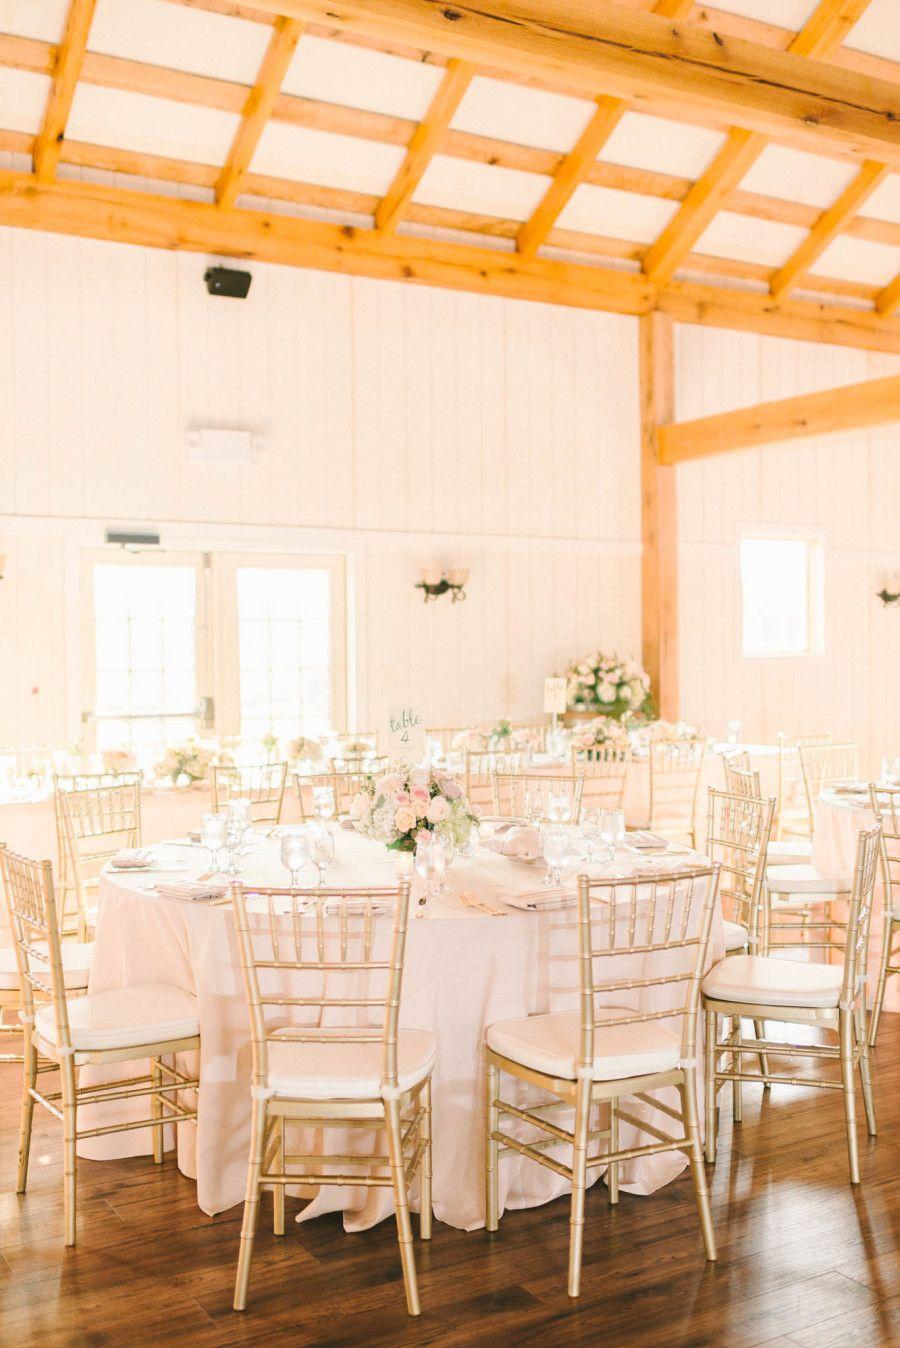 Shadow Creek Wedding.Rustic Chic Pastel Shadow Creek Wedding In Virginia Reception